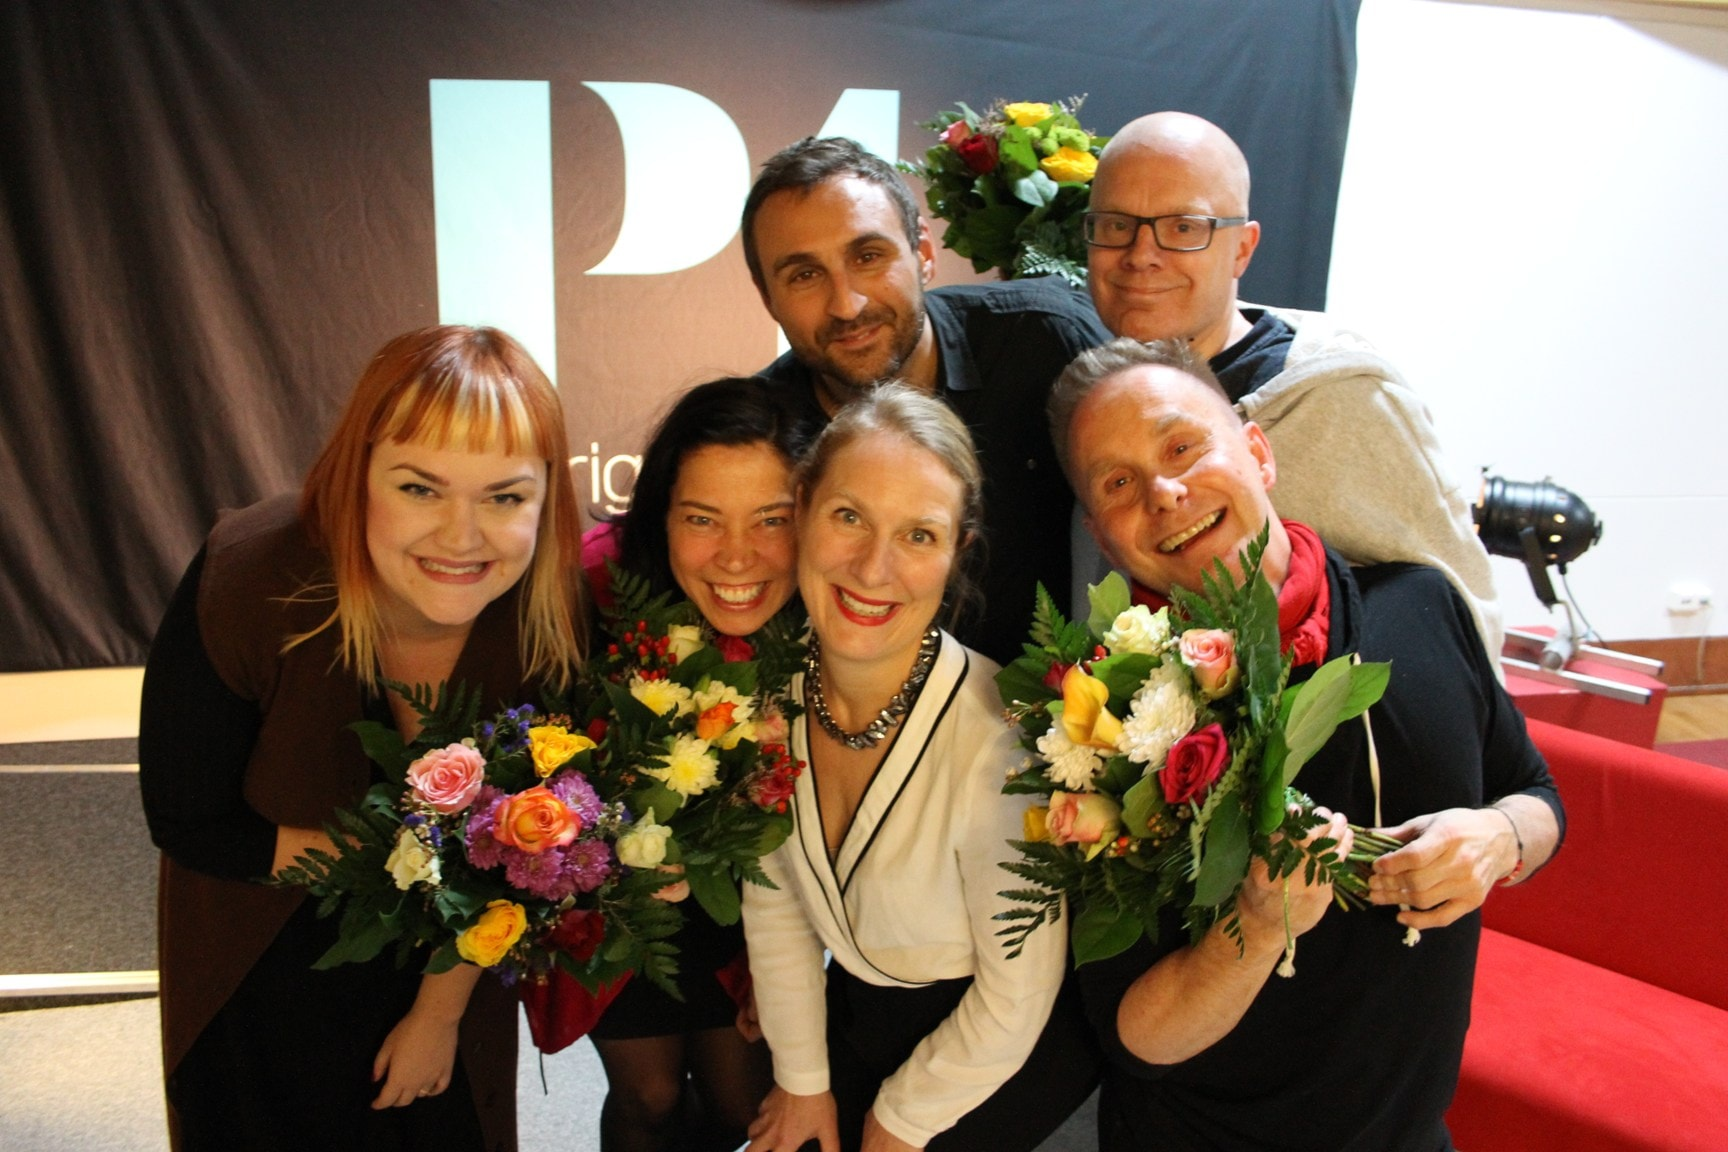 Marie Lundström, Ulph Nyström, Janne Berg och Hanna Olsson